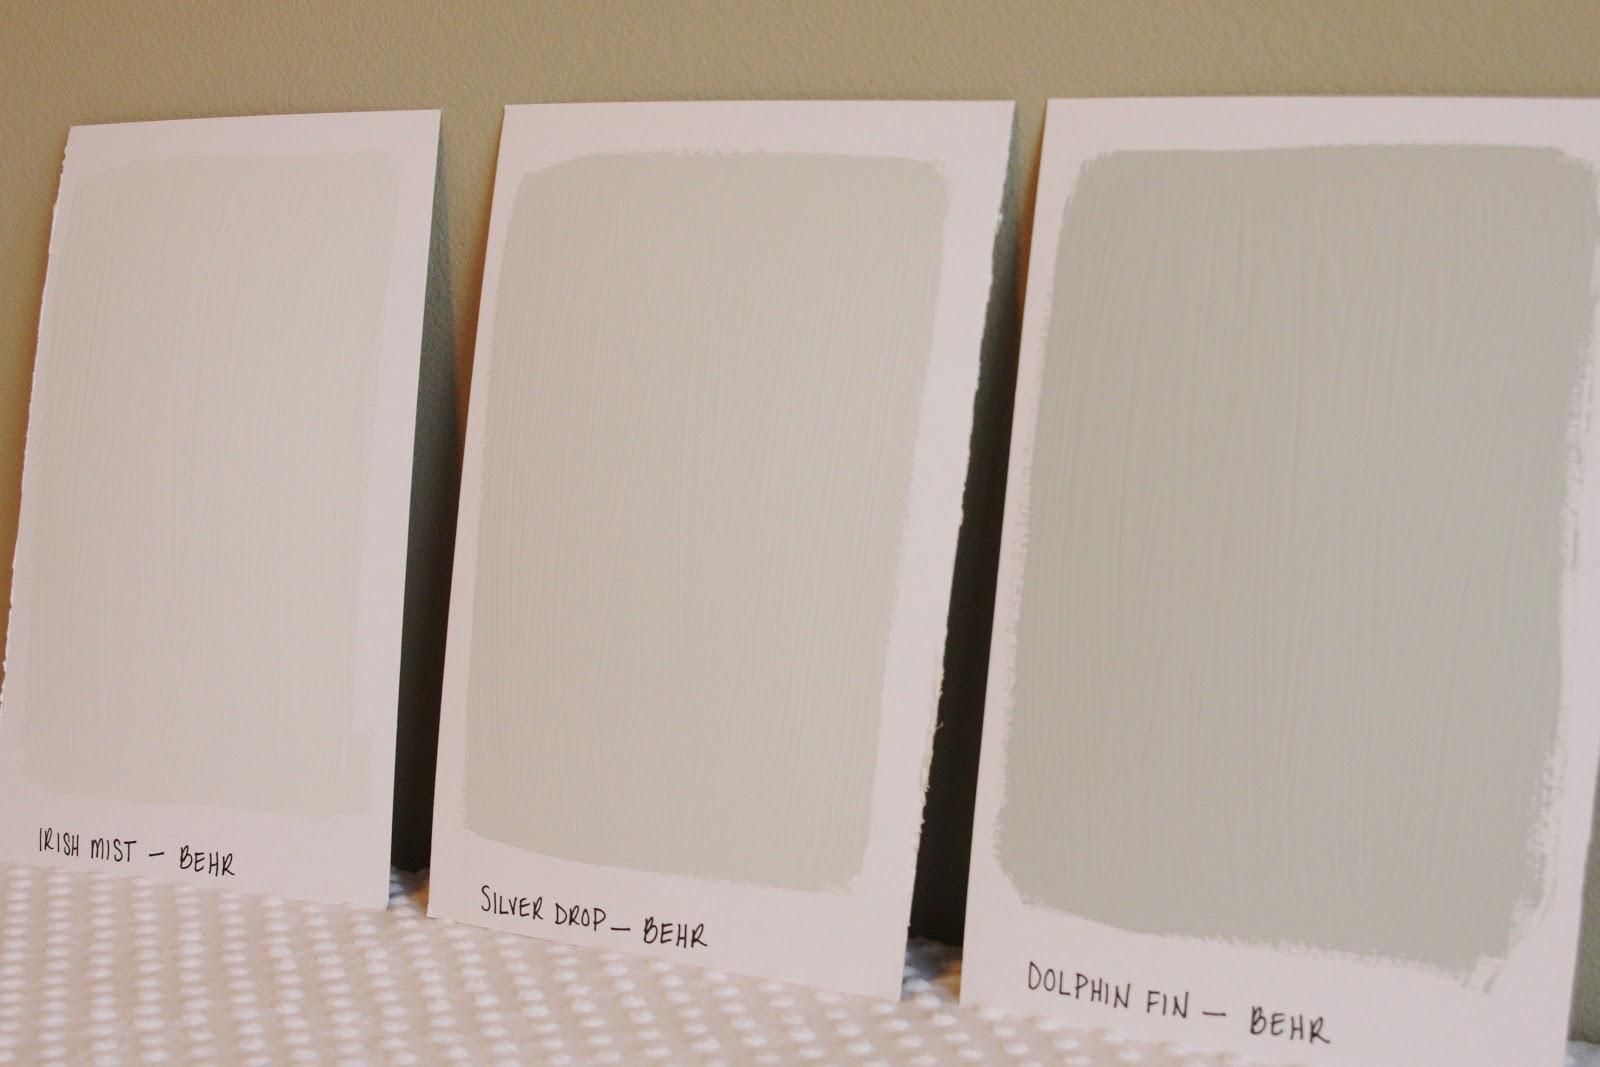 Etched Glass Paint Color Behr